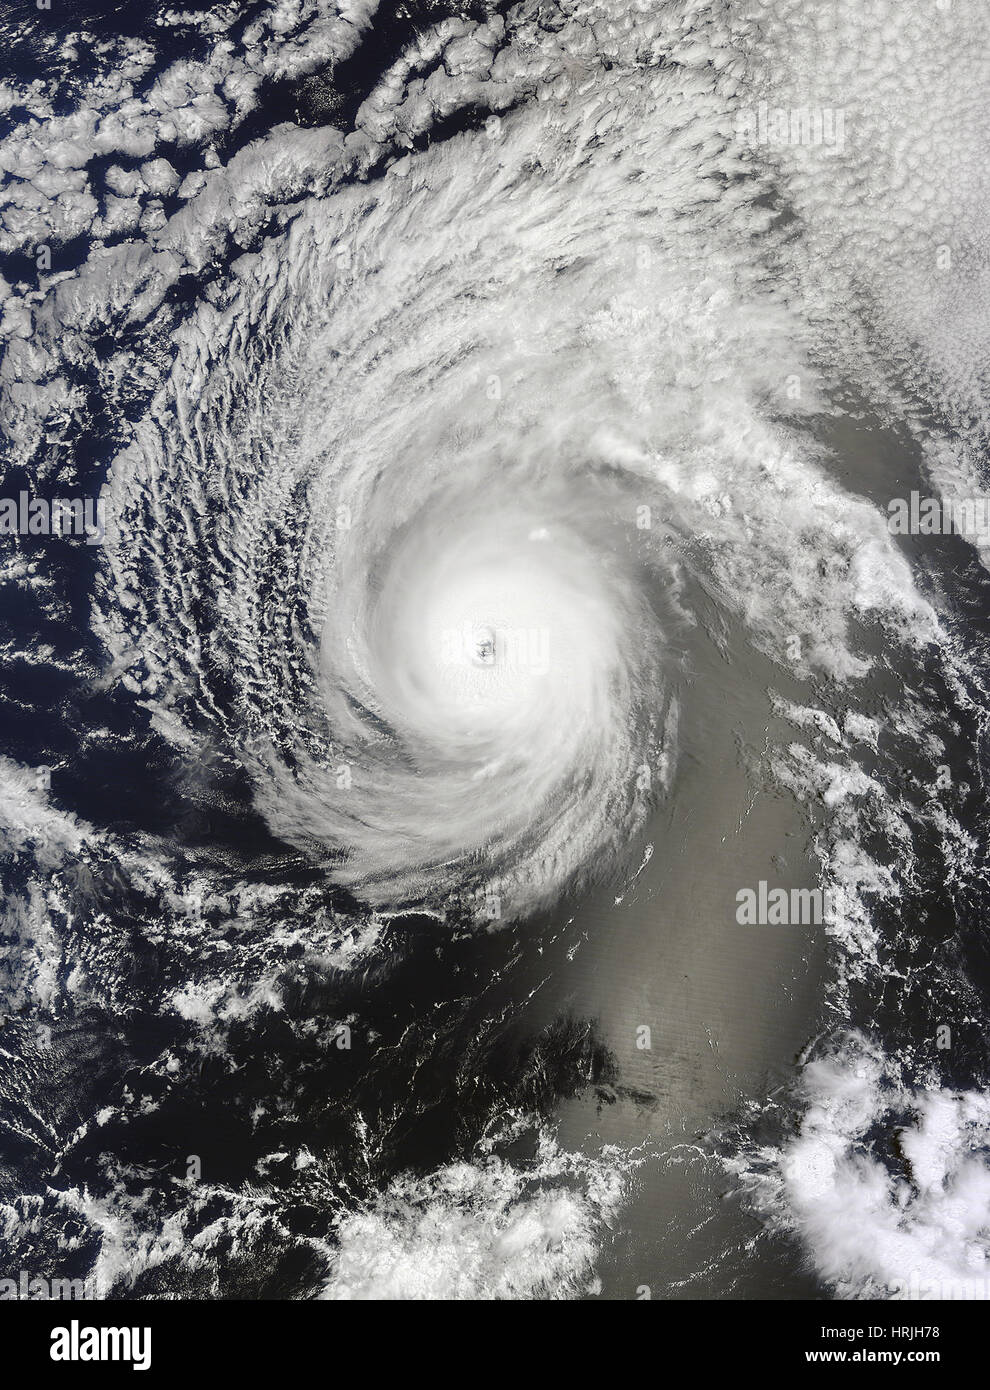 Satellite Image of Hurricane Iselle - Stock Image